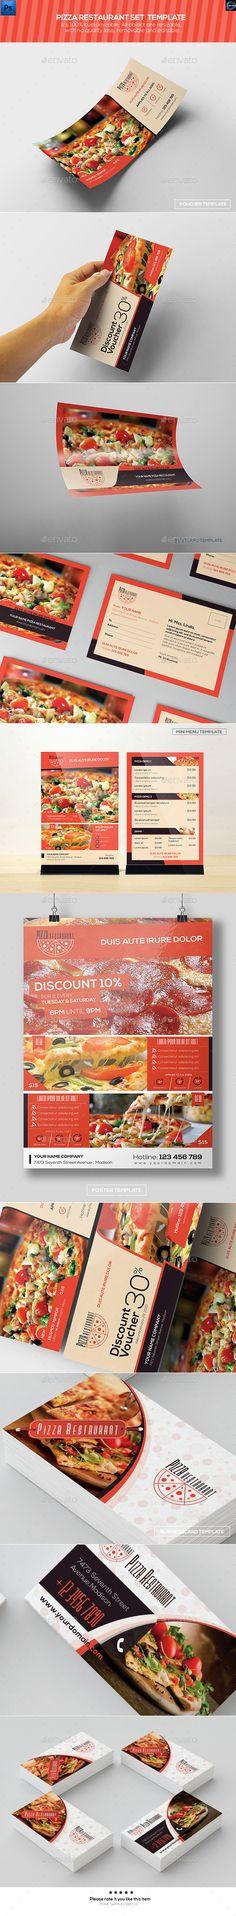 Pizaa Restaurant - Set Template #design Buy Now: http://graphicriver.net/item/pizaa-restaurant-set-template/12843096?ref=ksioks